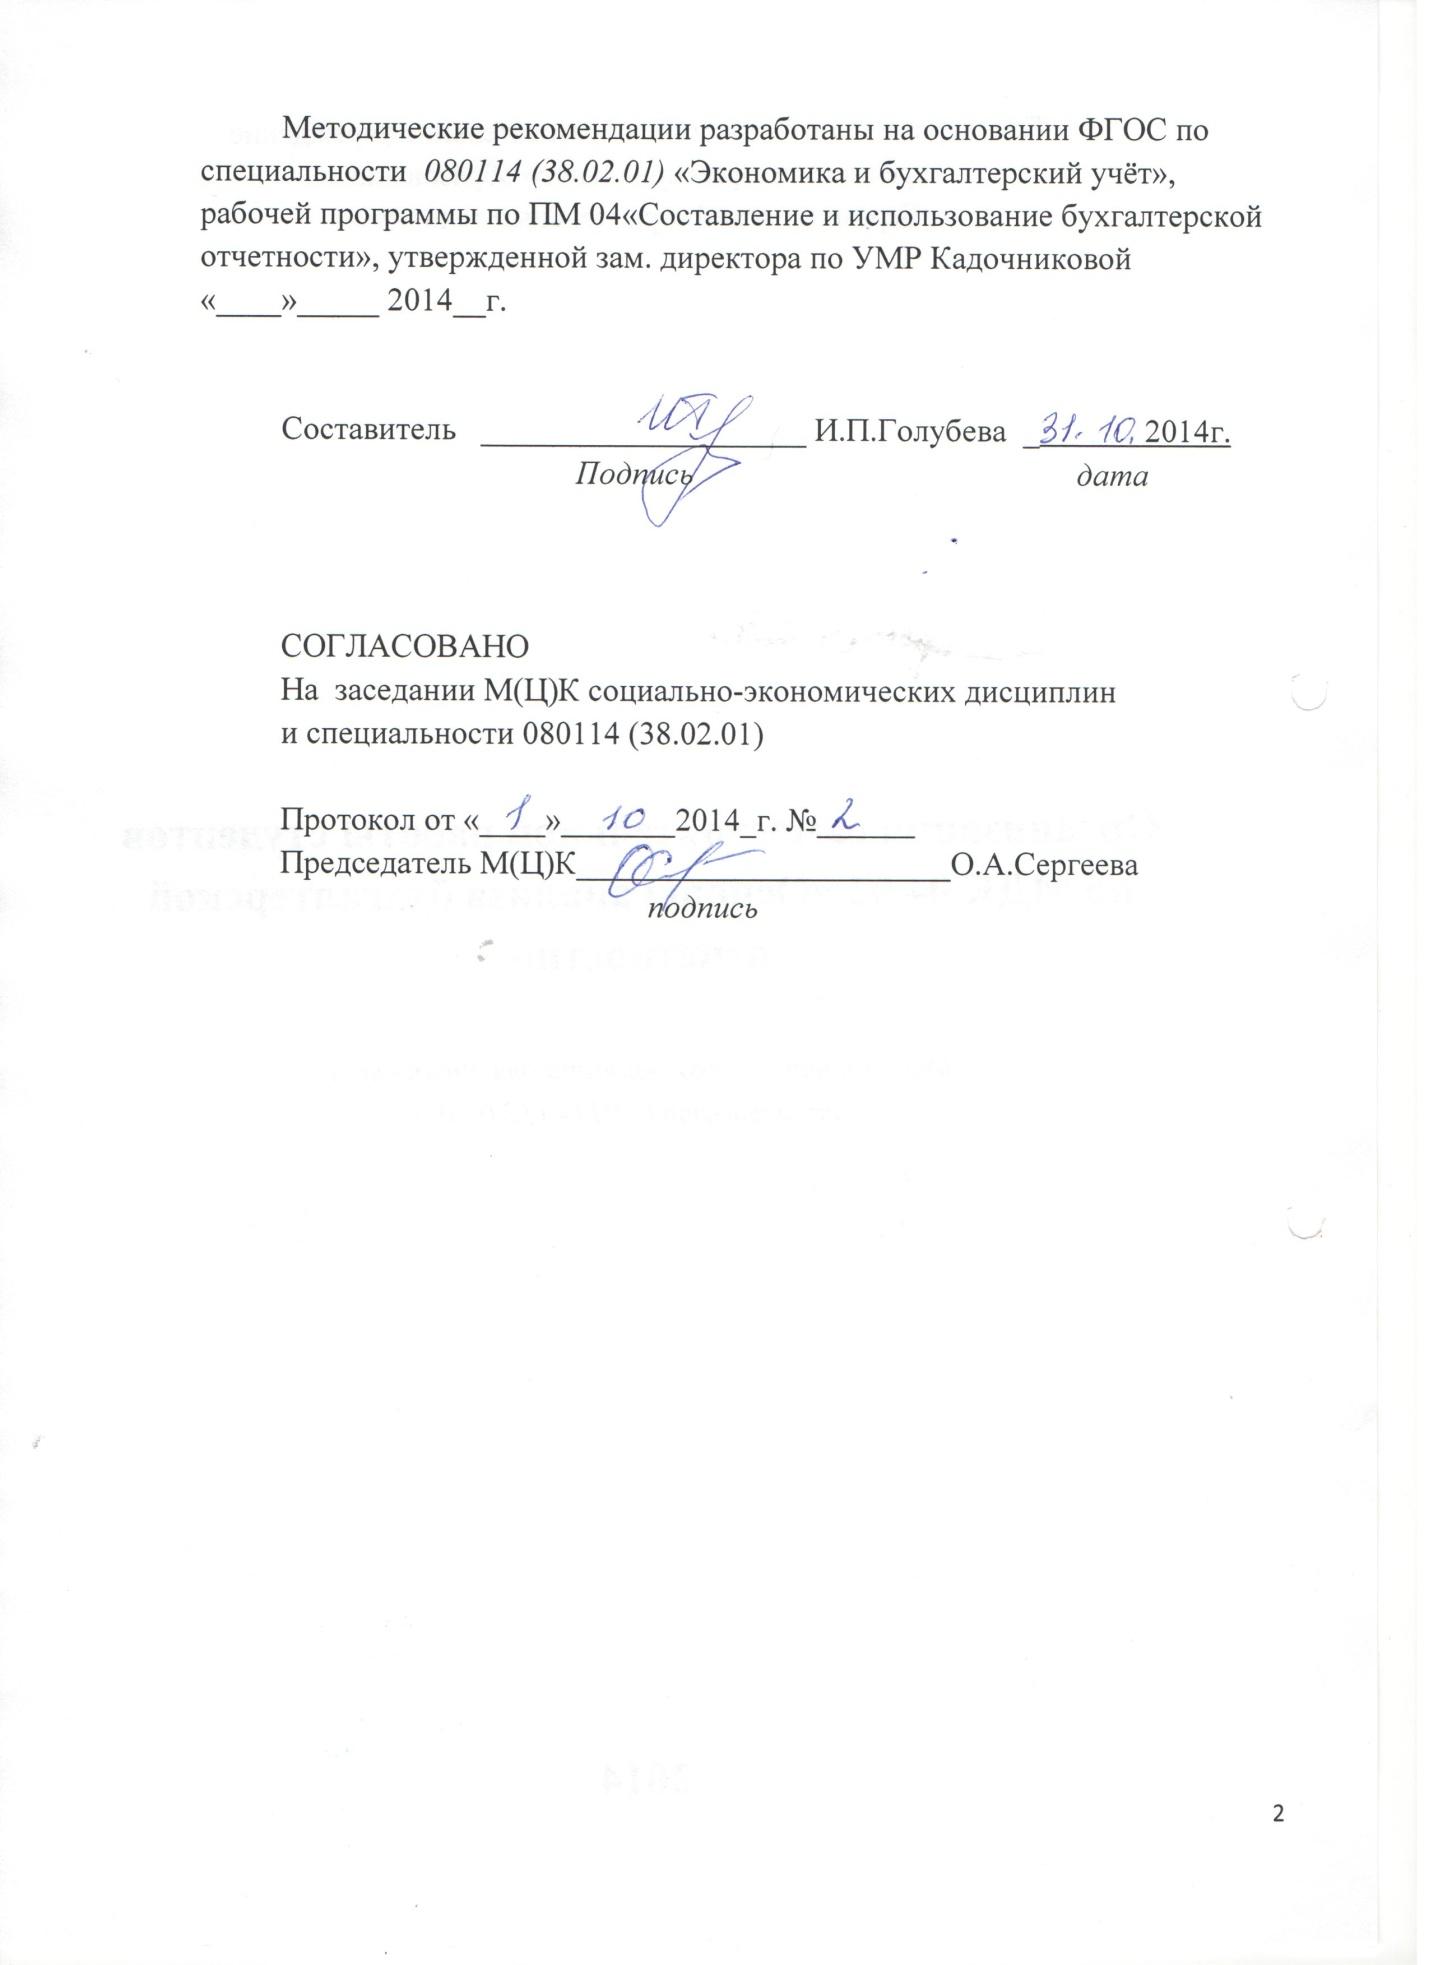 E:\Мои документы\тит лист сам раб МДК4.jpg